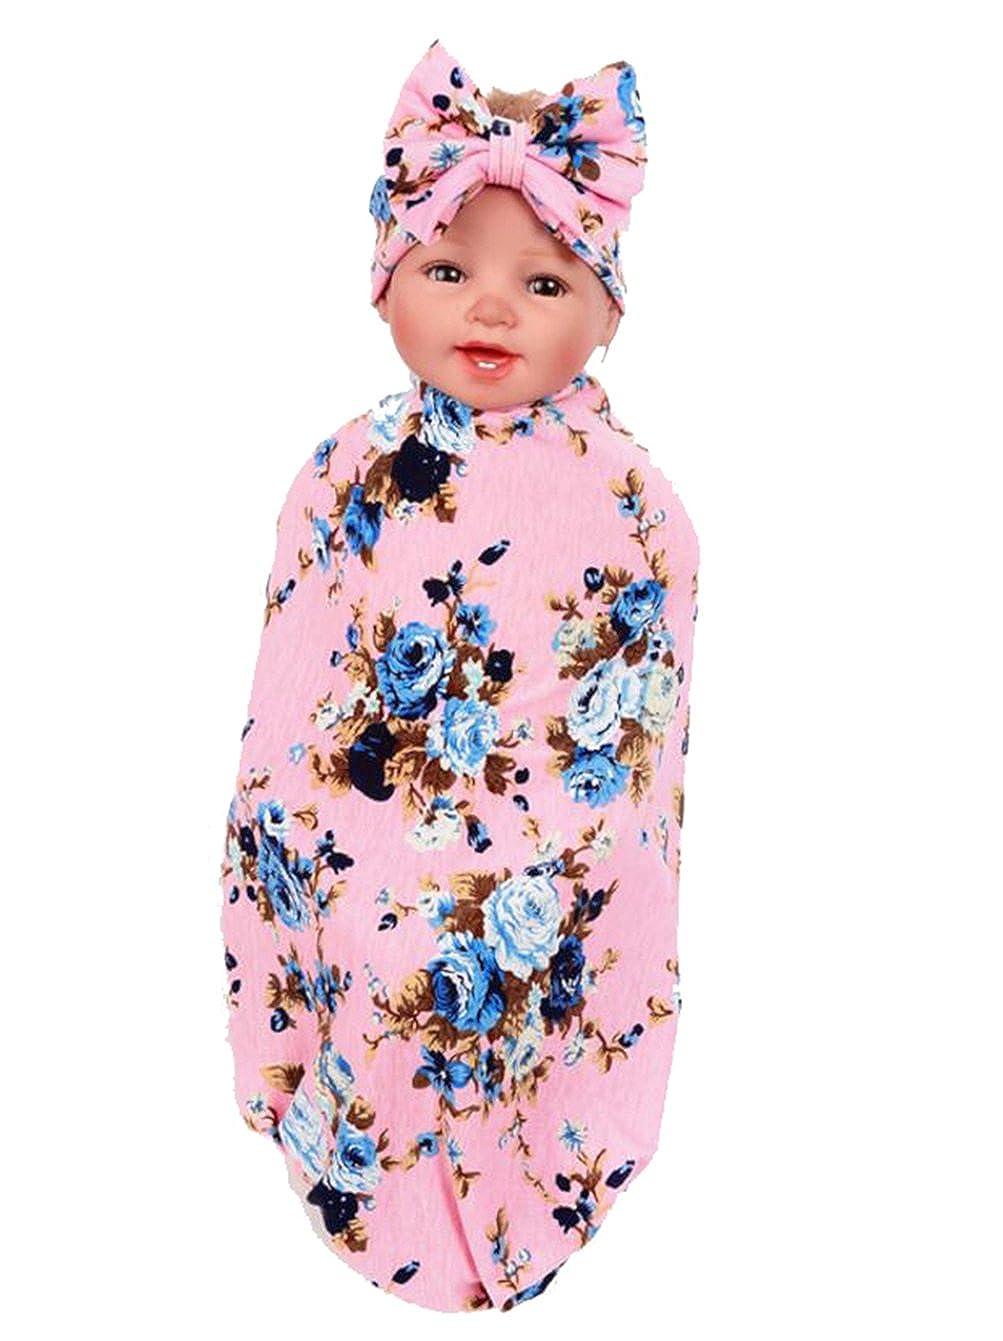 Hcside Newborn Infant Floral Swaddle Wrap Baby Swaddling Sleeping Bag Blanket Headband